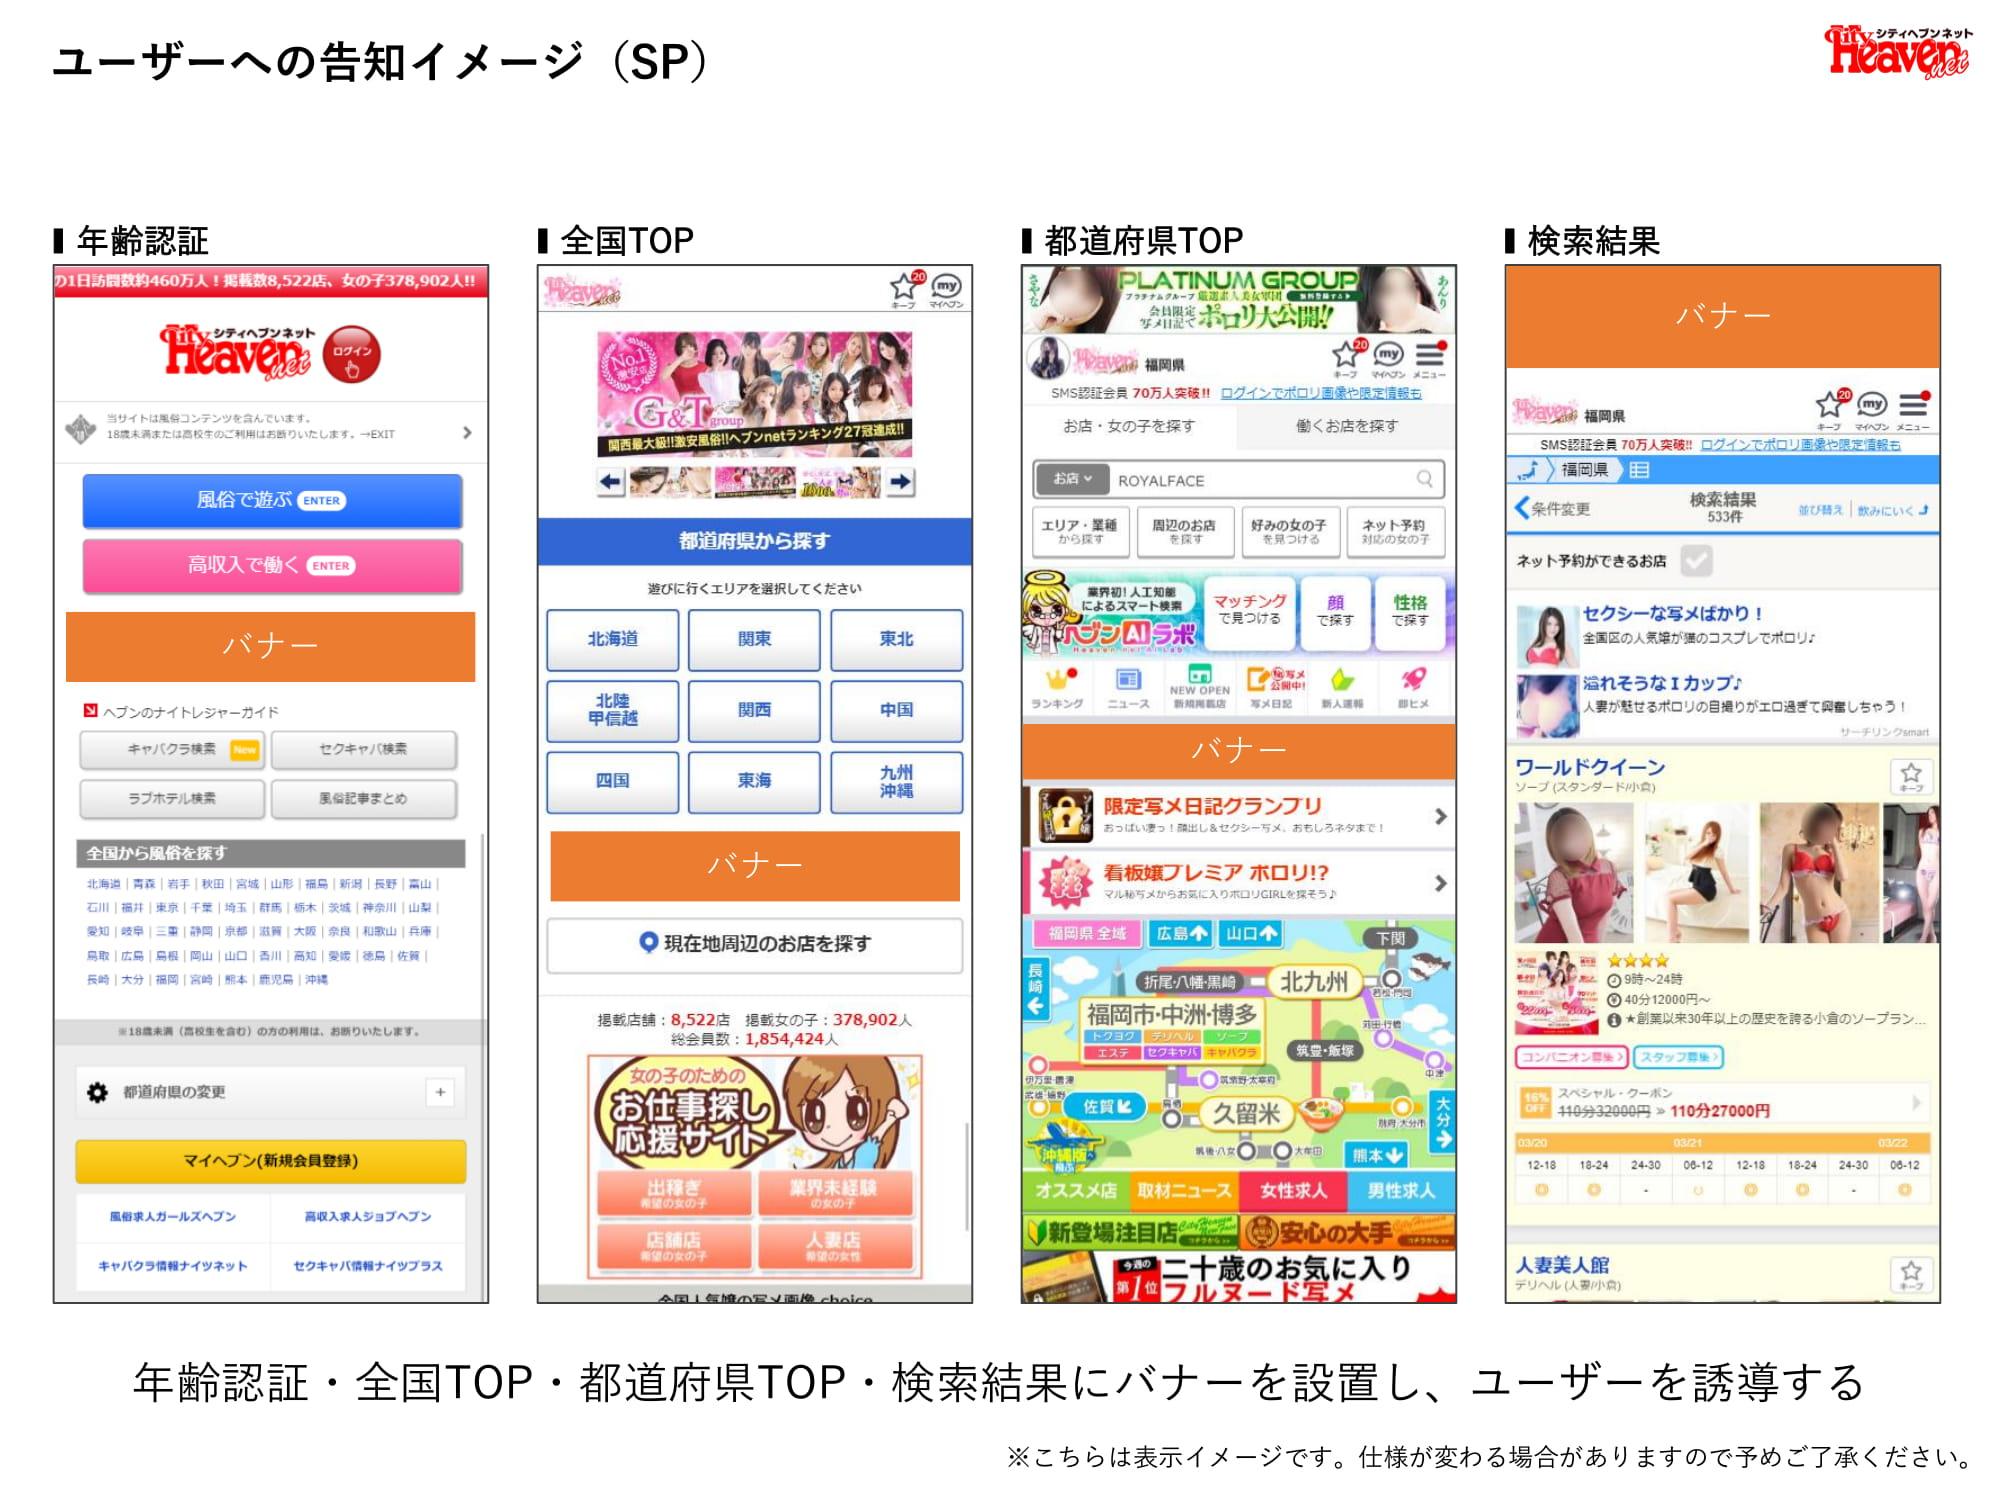 kuchikomi_kikaku-4.jpg